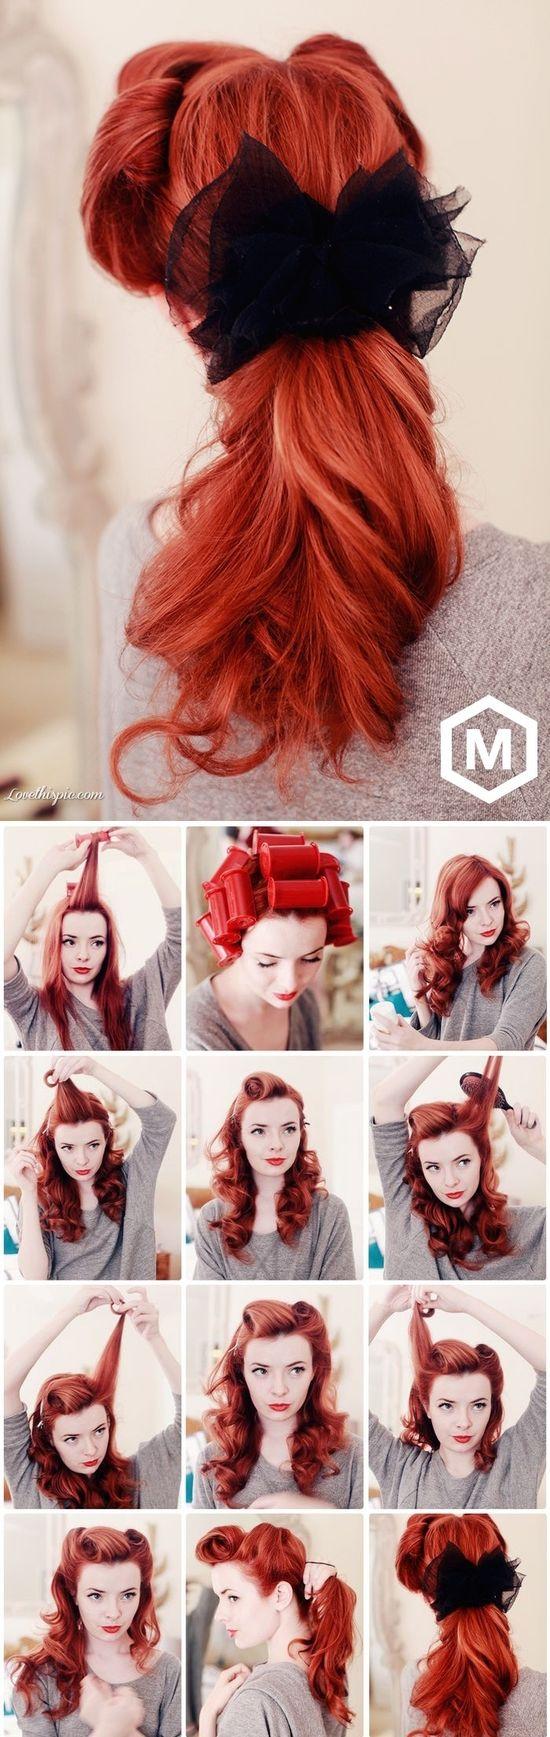 DIY Vintage Hairstyle diy pinup hair style diy easy diy diy hair diy fashion beauty diy diy style  Free Wire Name Information.  www.own-craft-bus...  FREE NAIL ART INFORMATION  www.nailtechsucce...  More Fashion At   WWW.THEDILLONMALL...